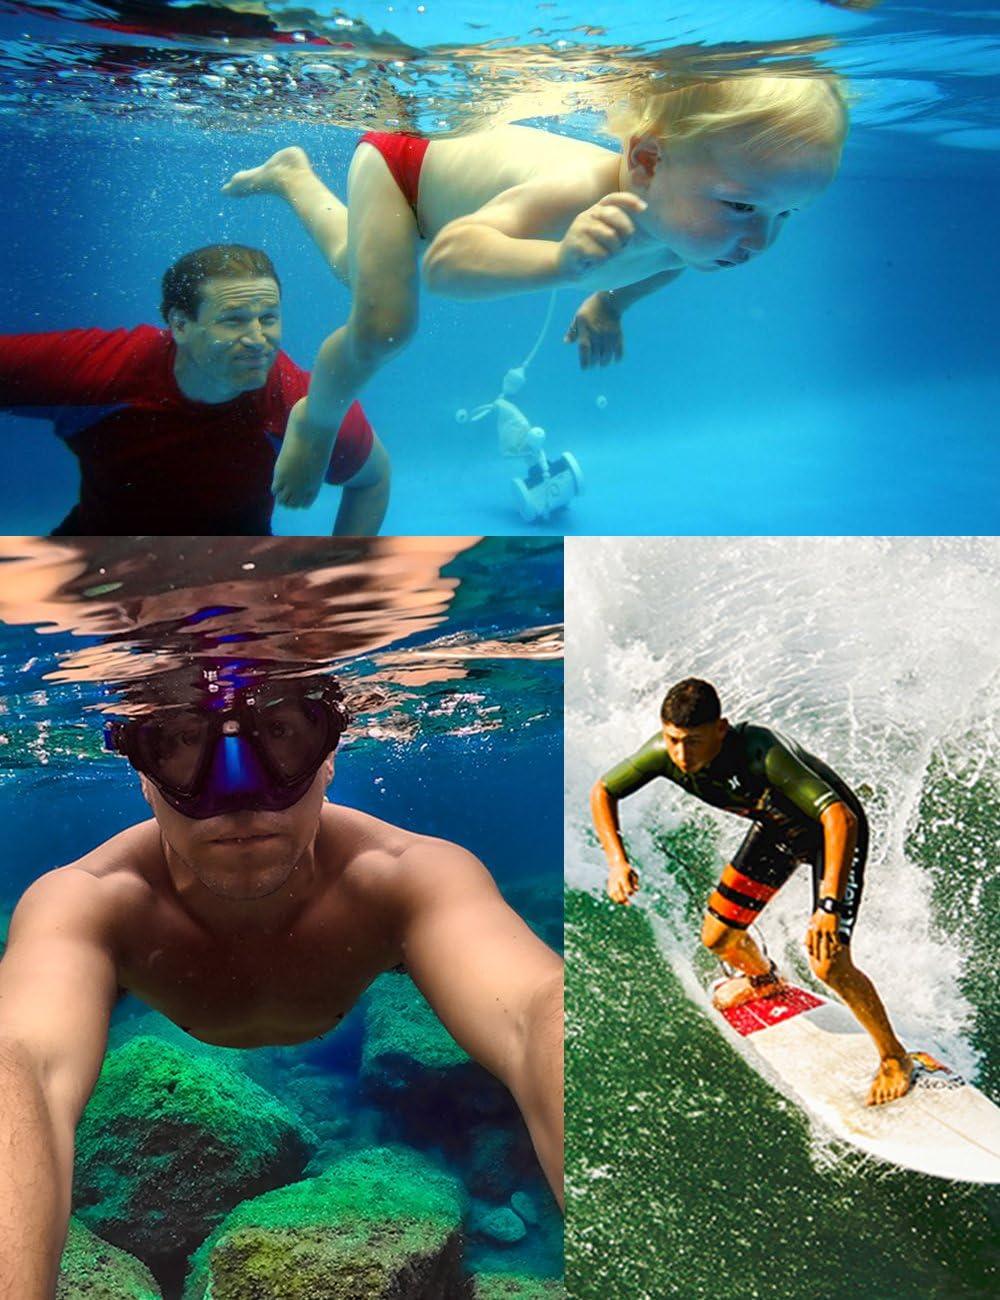 Wristband for Underwater GoPro,Waterproof Camera Keys,Sunglass,etc Yellow Kolasels Waterproof-Non-Slip Camera Float Strap with Hand Grip Lanyard